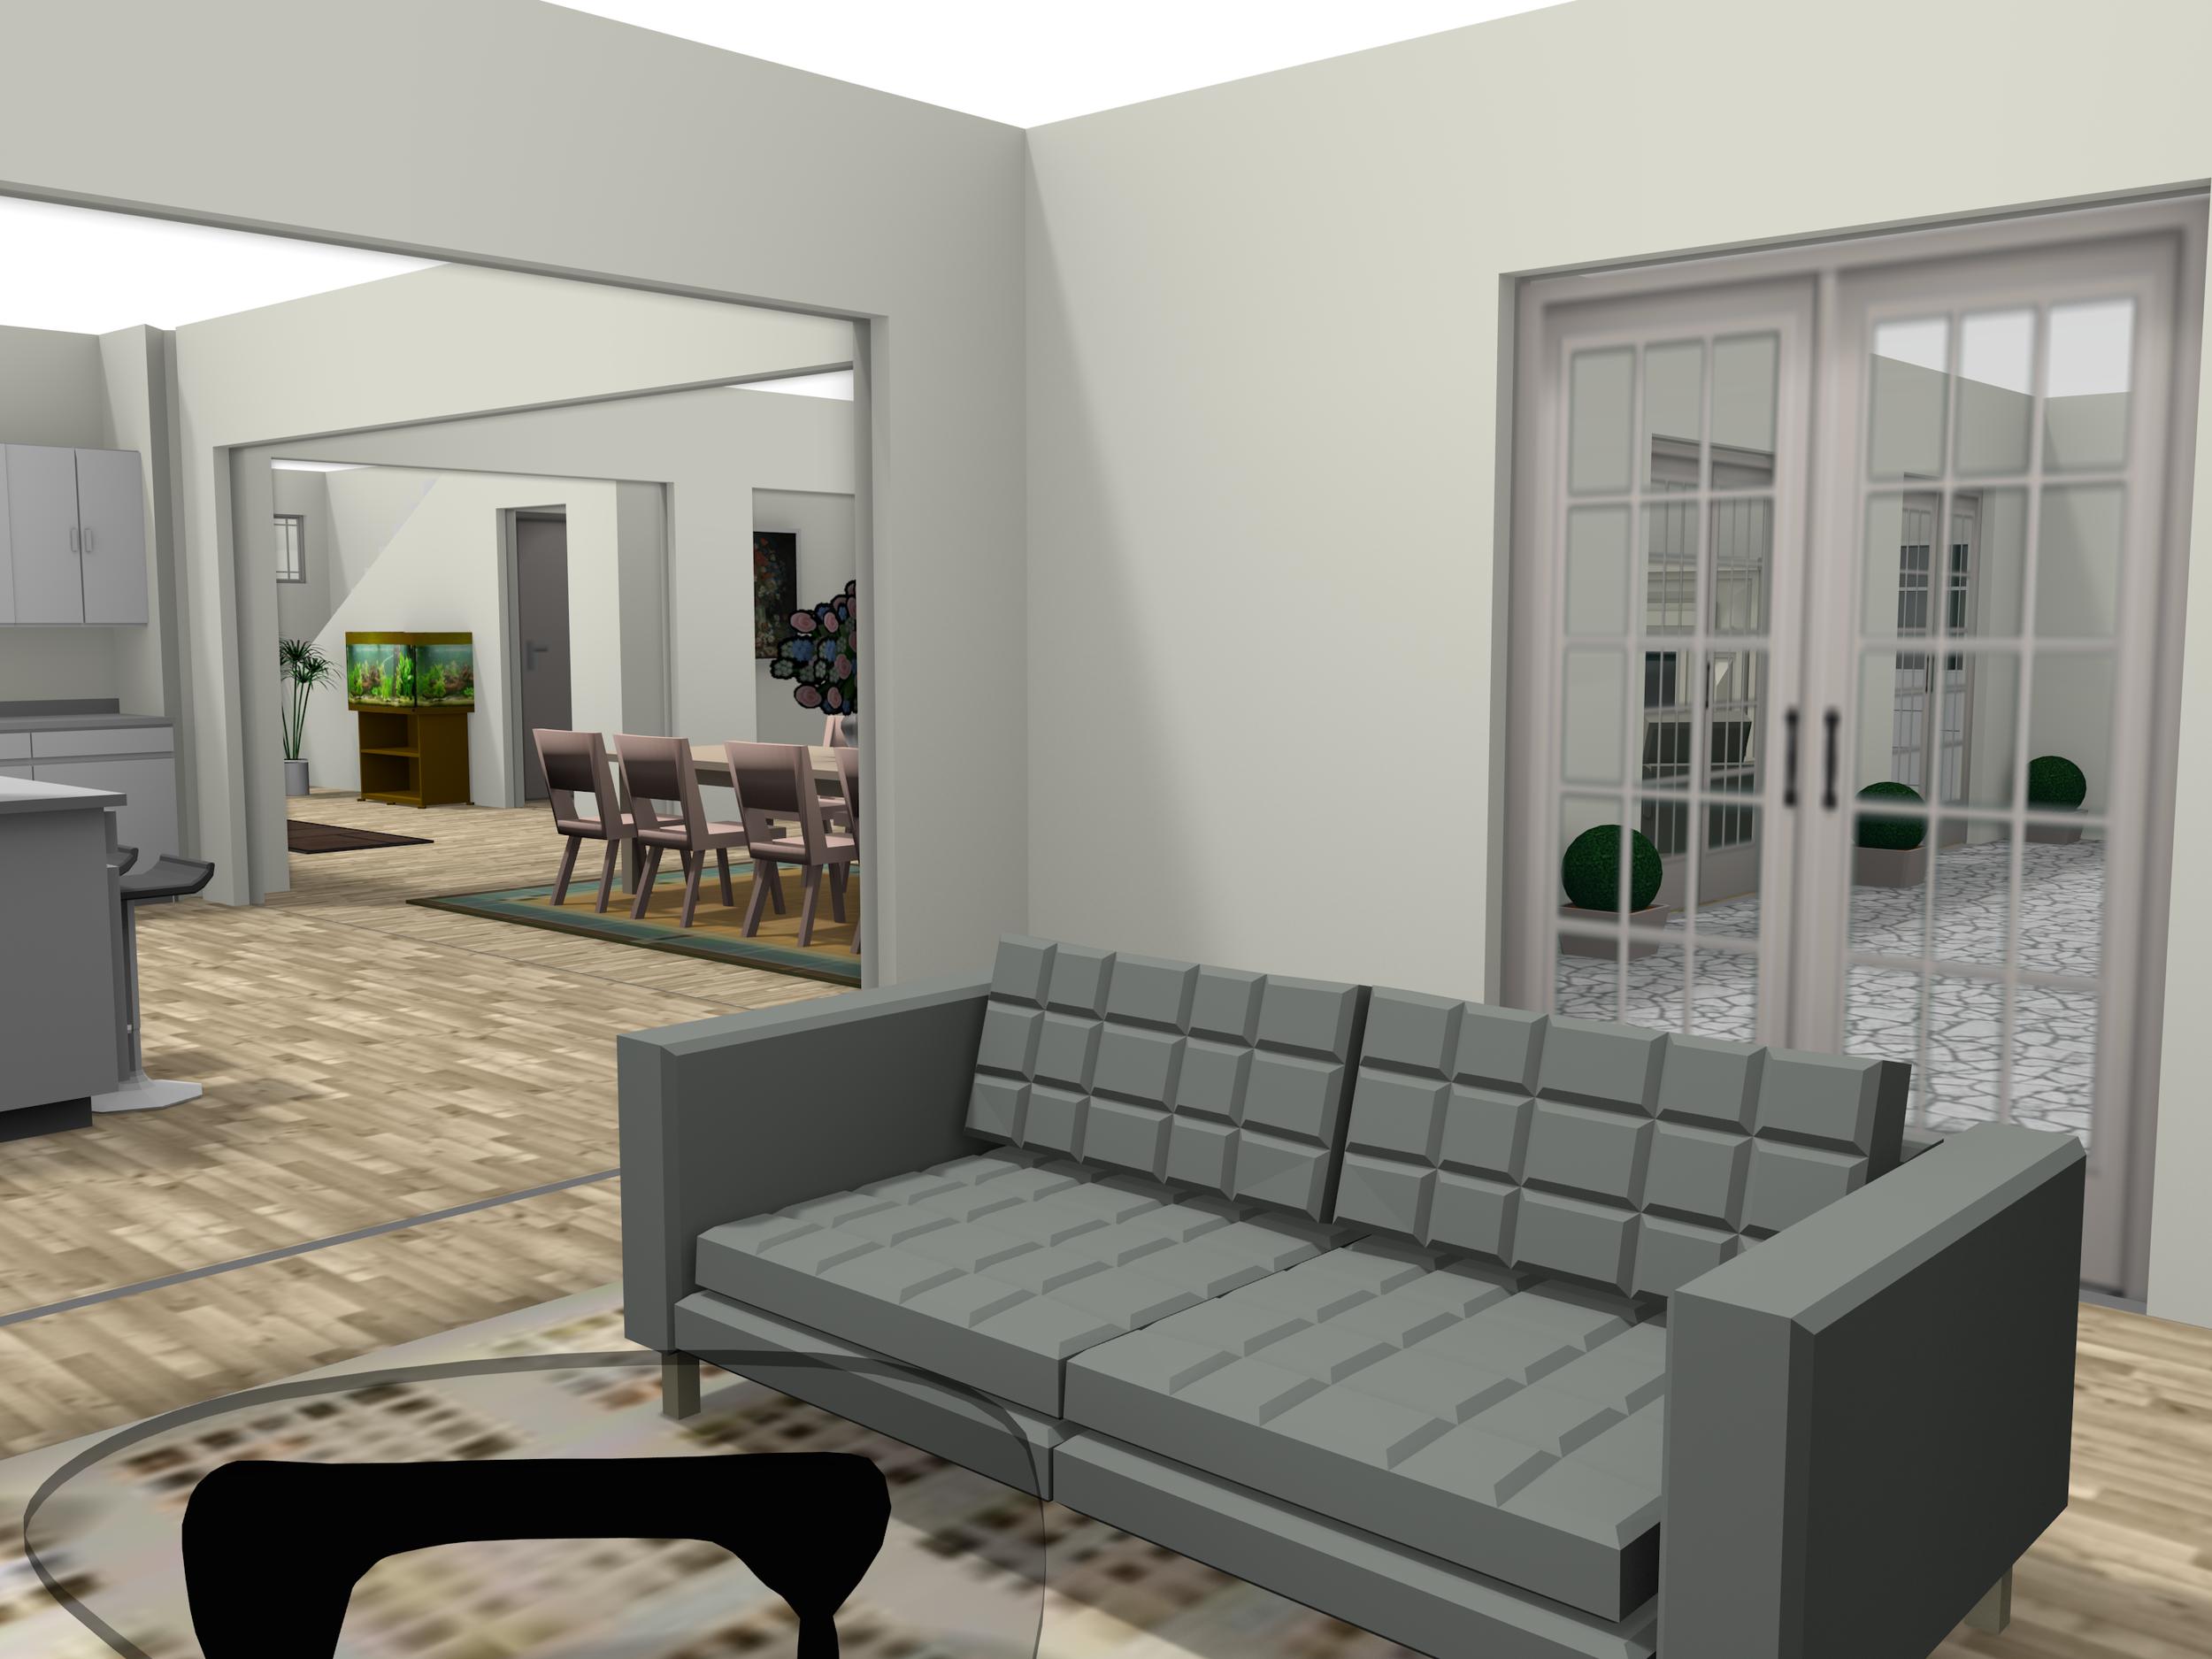 furnished (4) (1).png